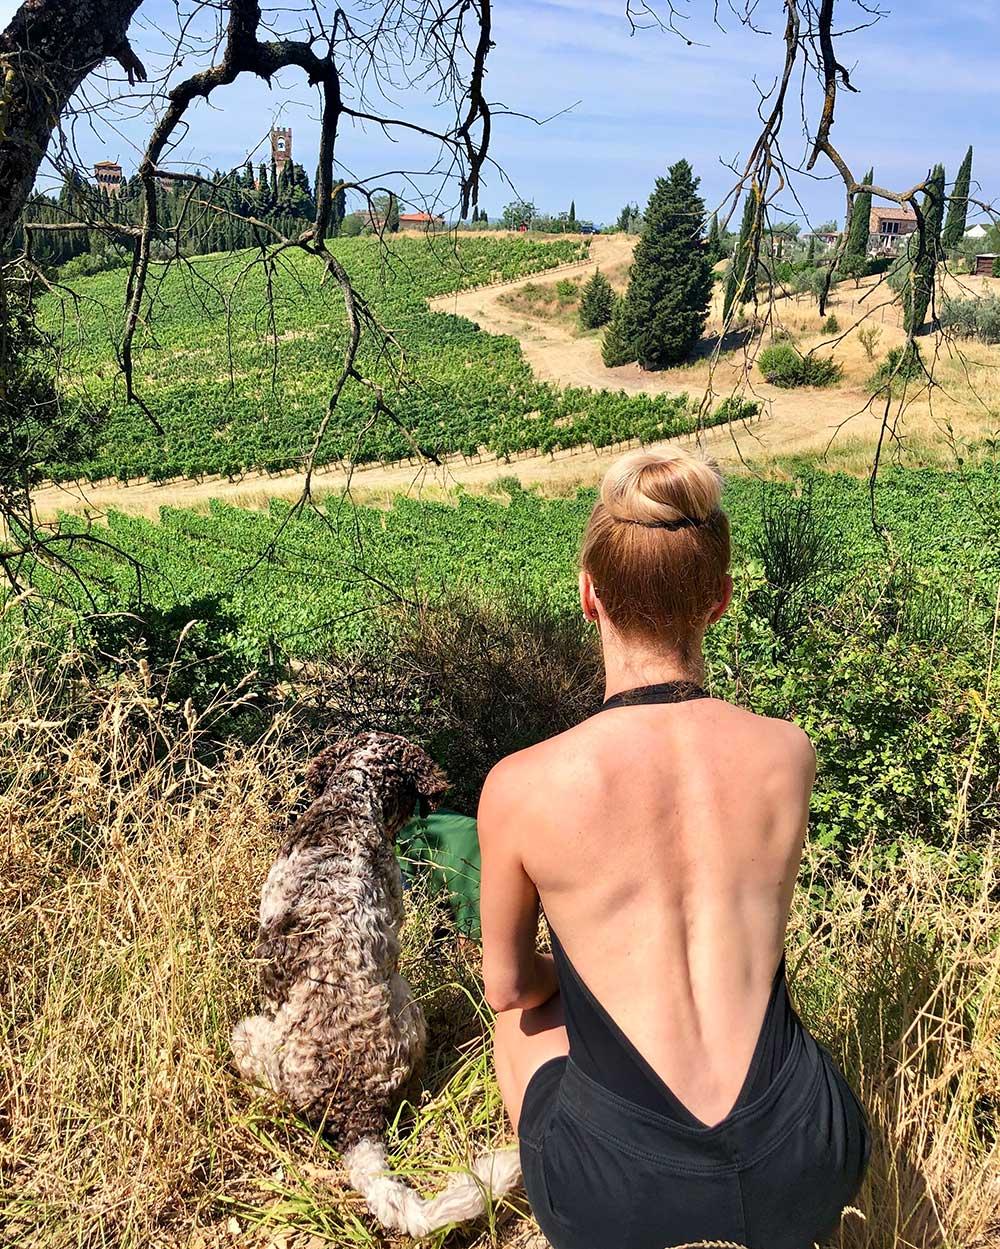 truffle-hunting-tuscany-eve-dawes.jpg